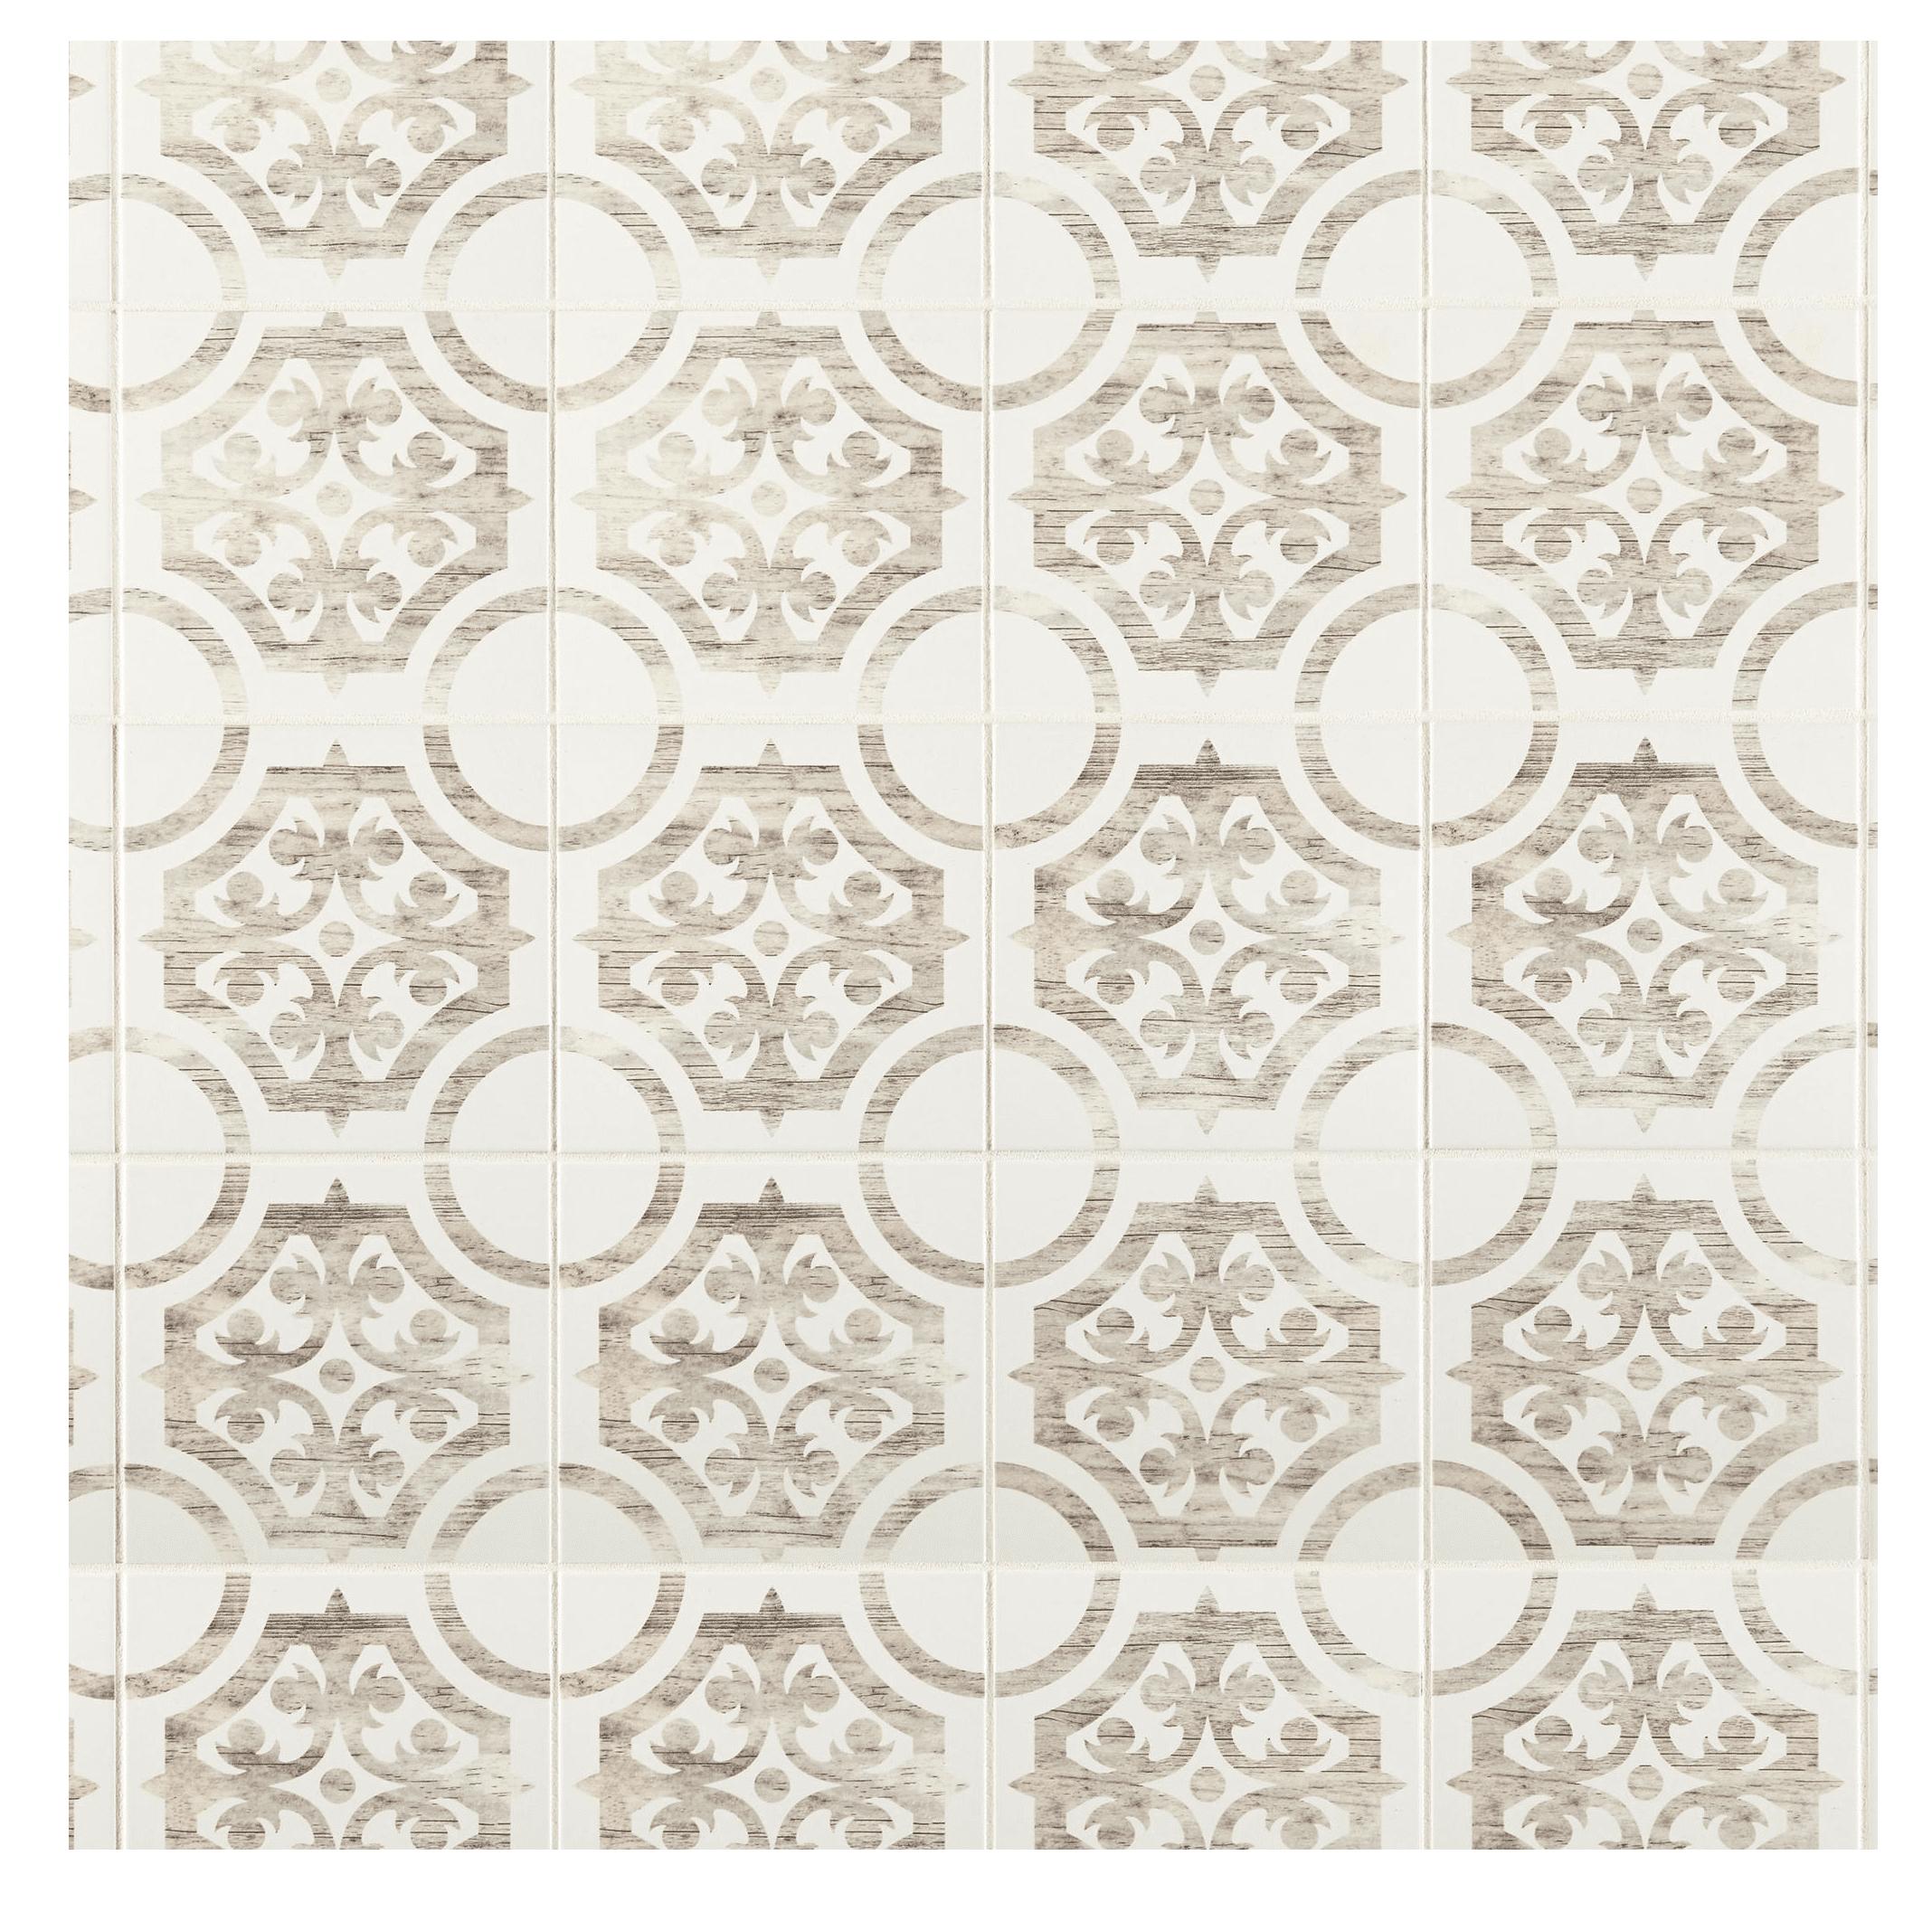 Moda Del MarWoodfield Lane Matte Porcelain Tile